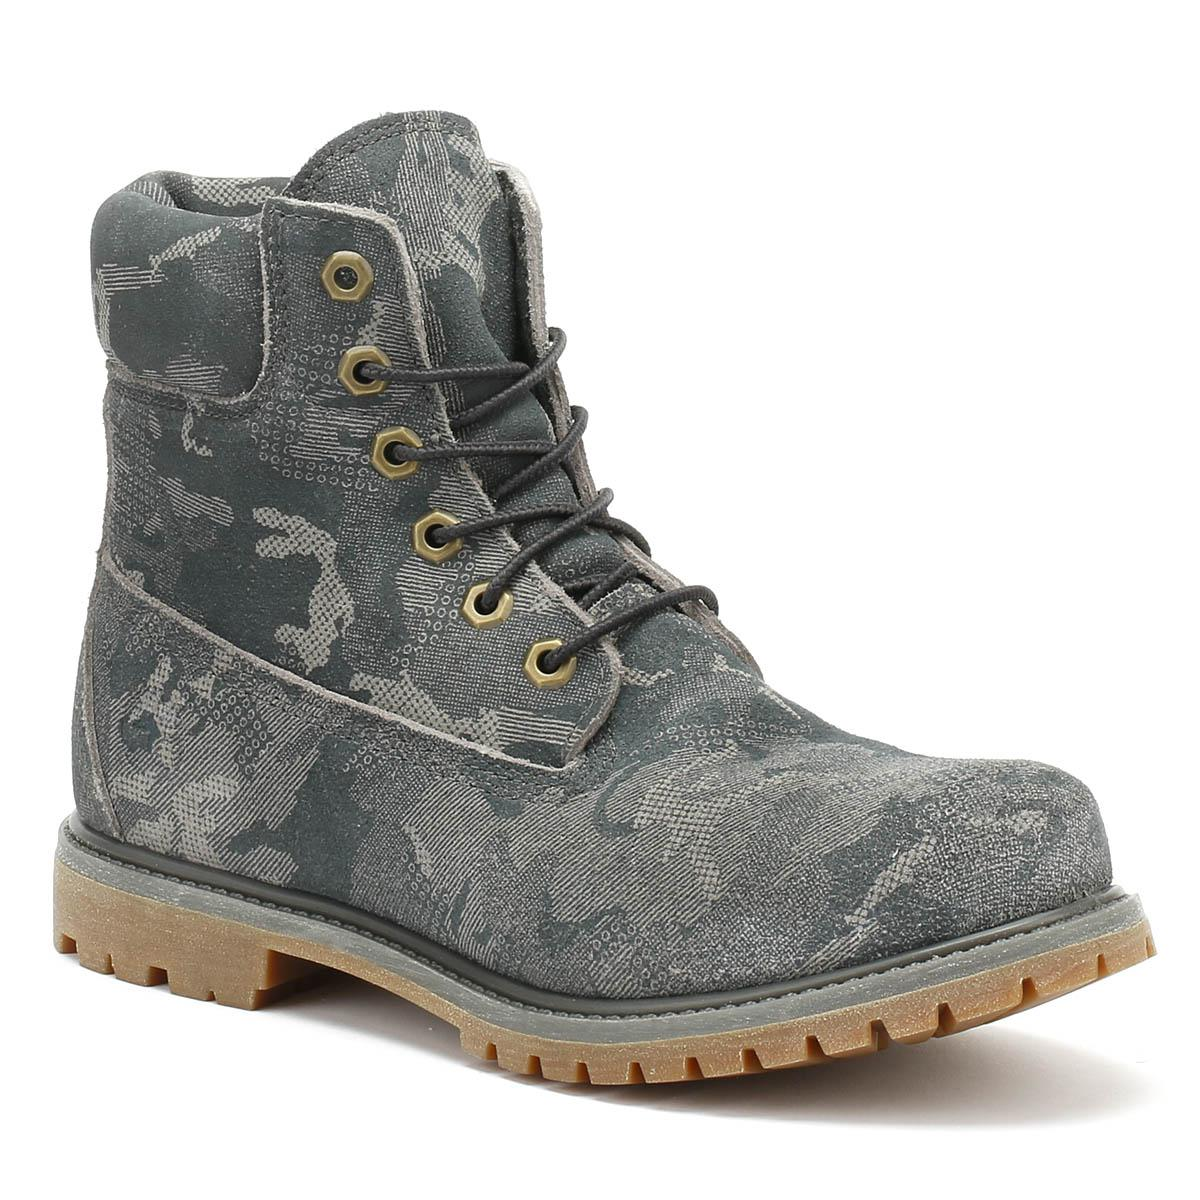 6ad053ec1603 Timberland - Gray Womens Multi Grey Camo 6 Inch Premium Boots - Lyst. View  fullscreen